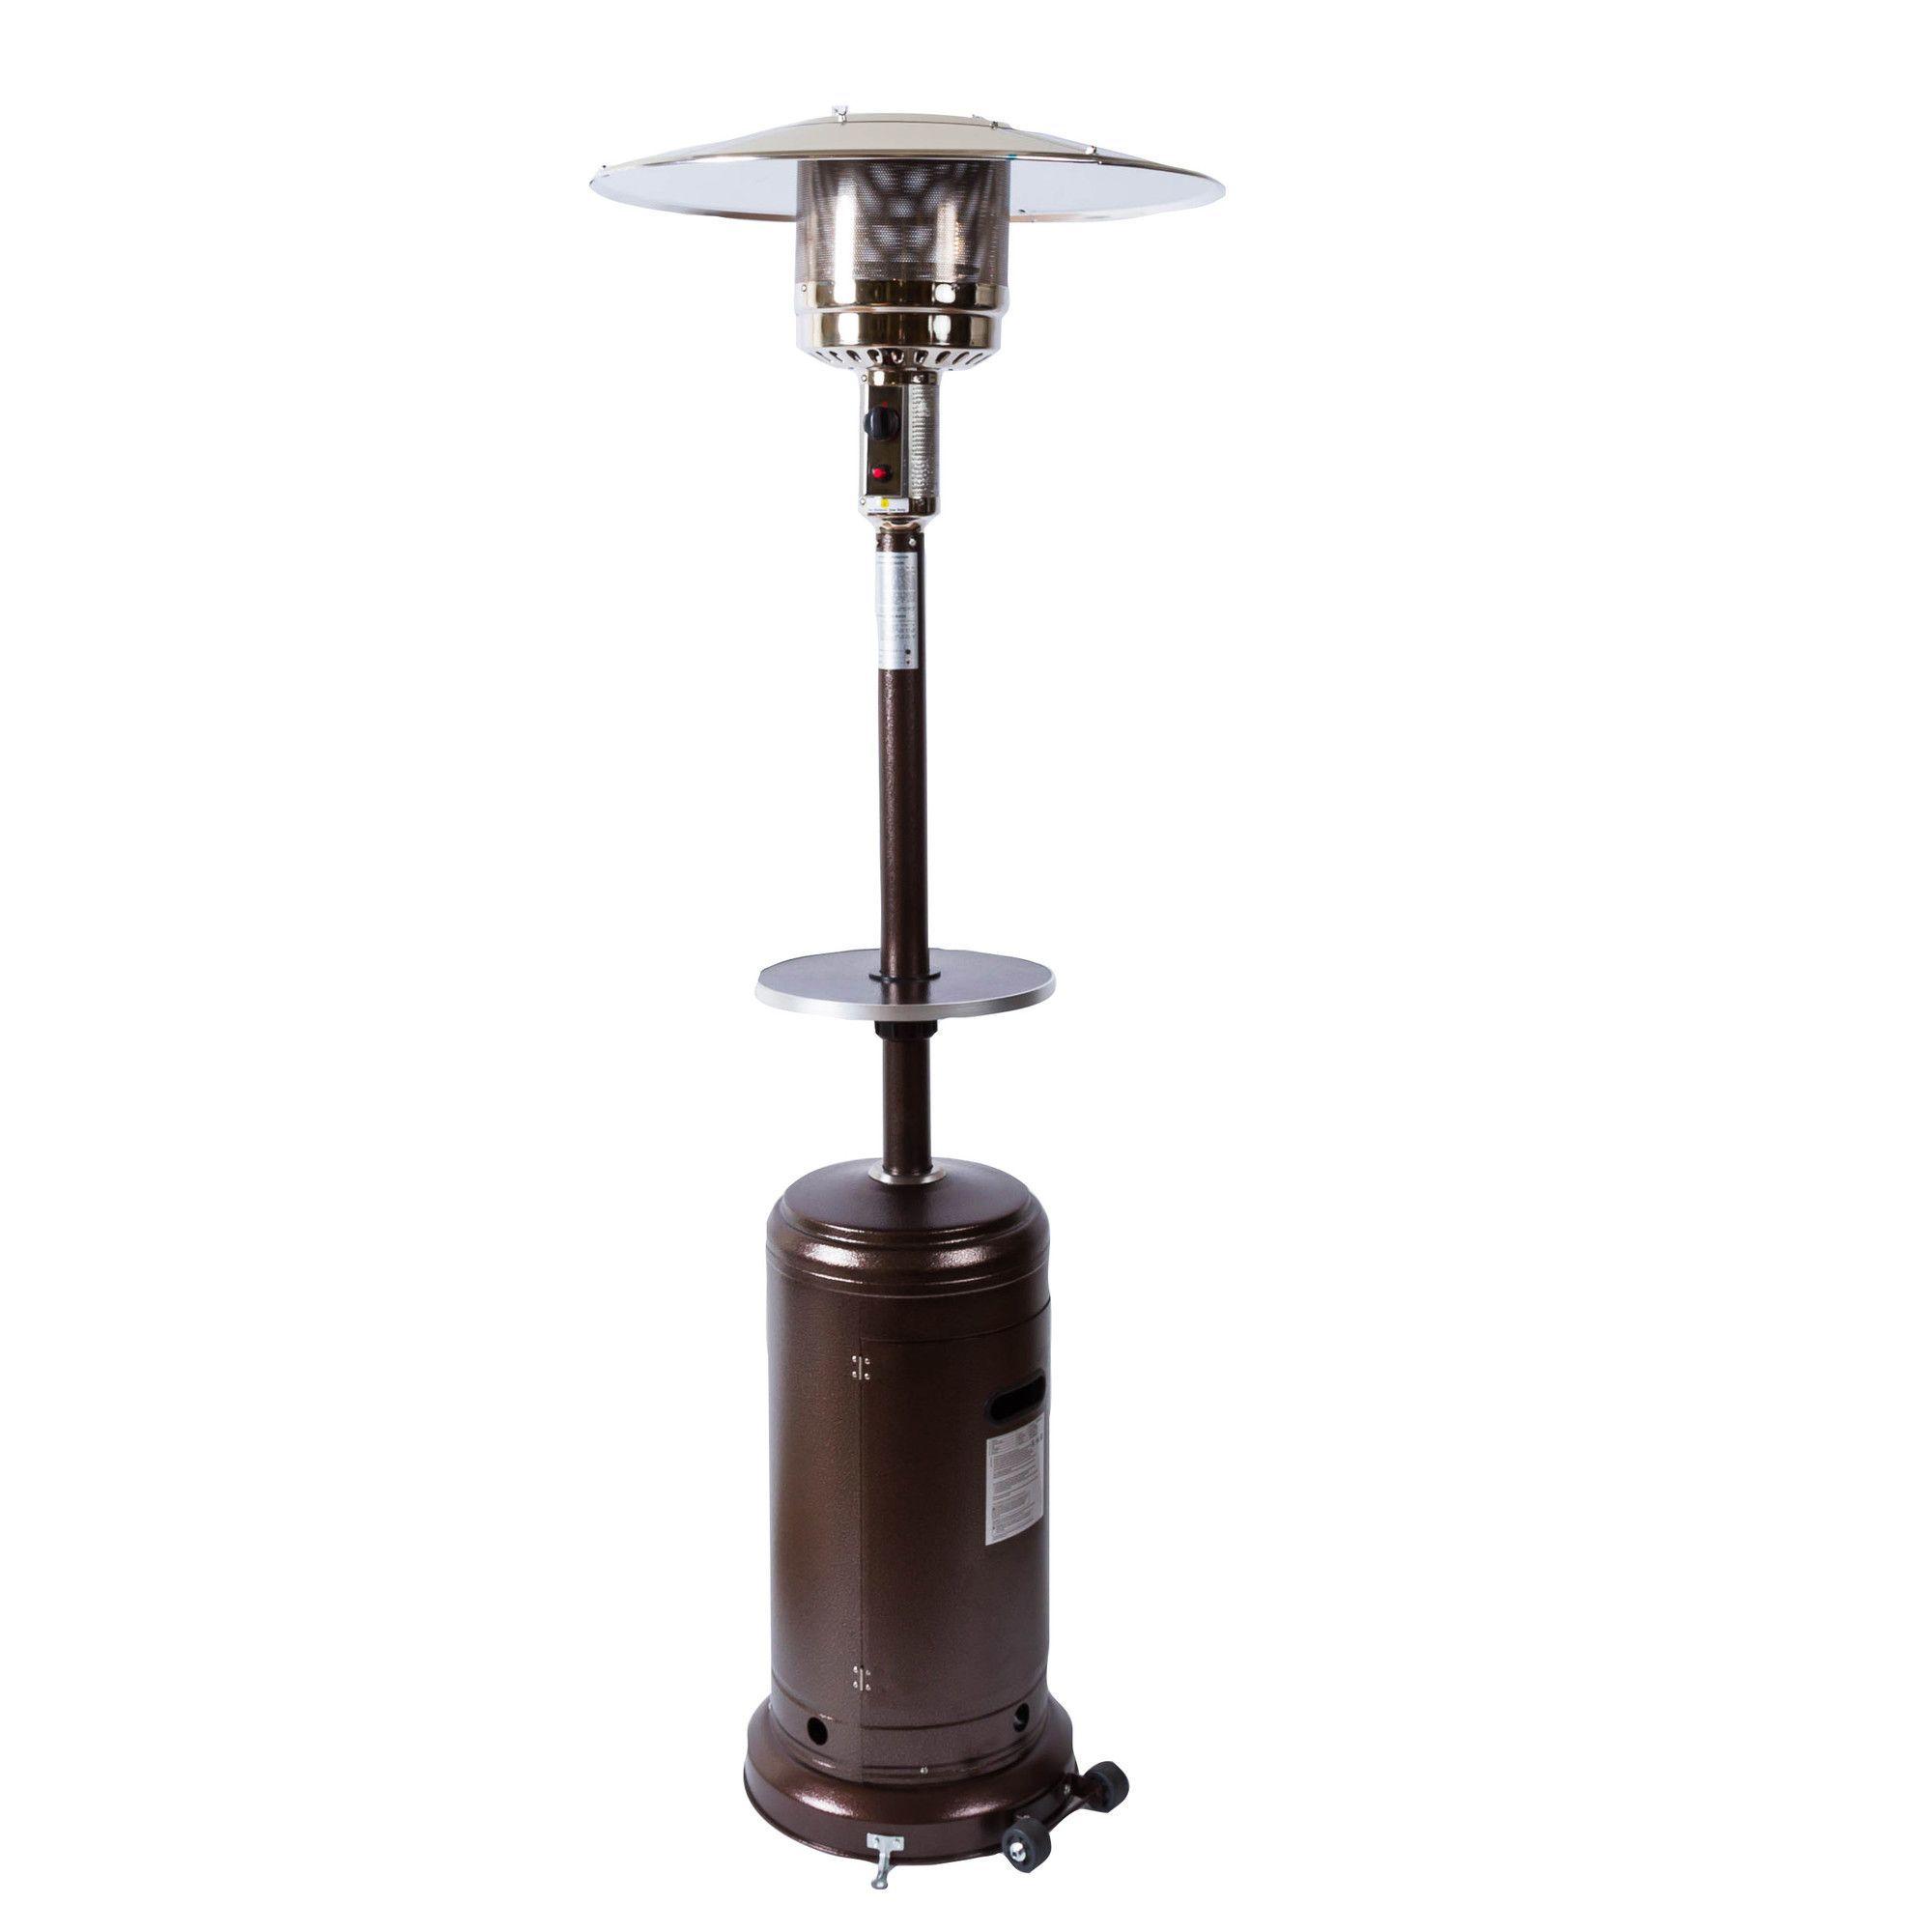 Bombay™ Outdoor Overhead Propane Patio Heater